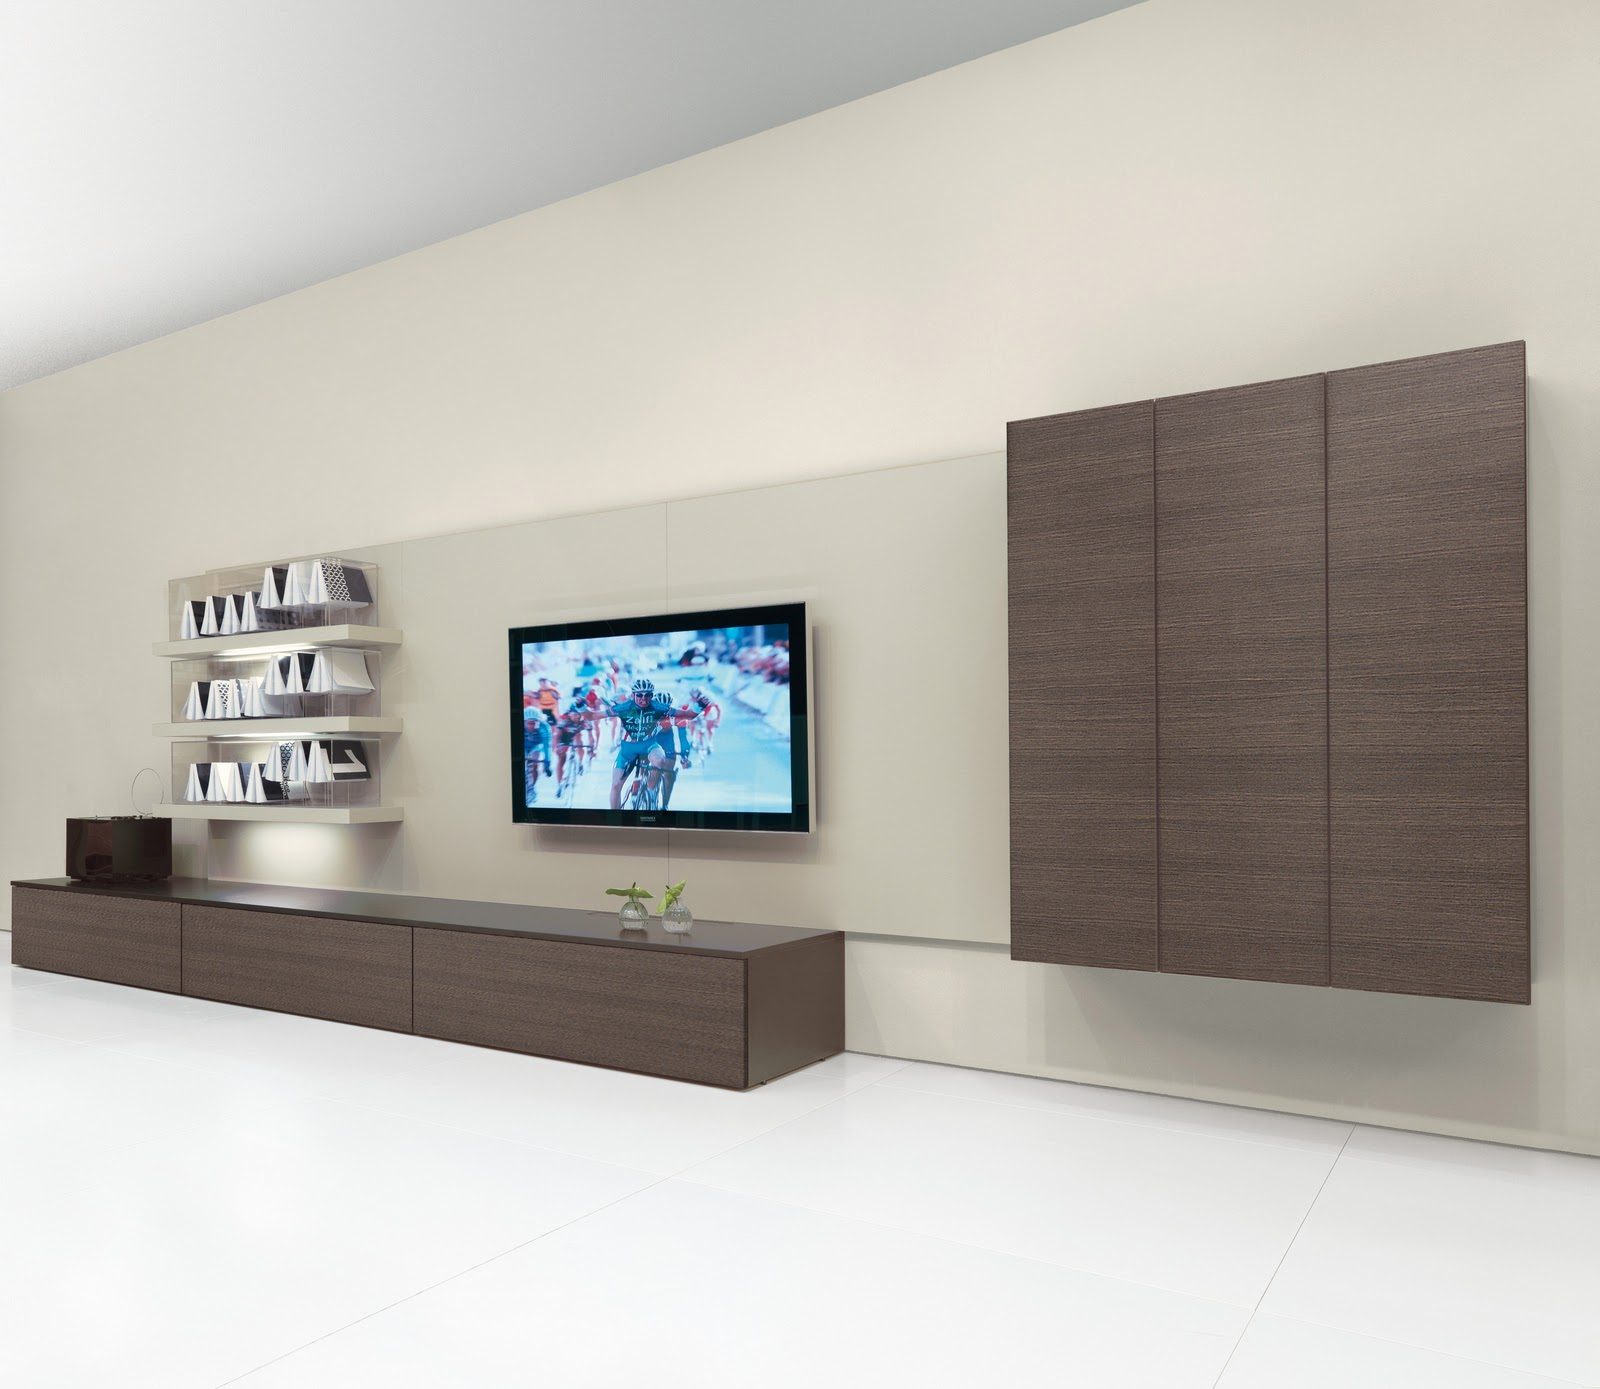 imagenes de muebles de melamina para sala - [PDF]CATALOGO MOBILIARIO 2 pdf Oficina de Suministros